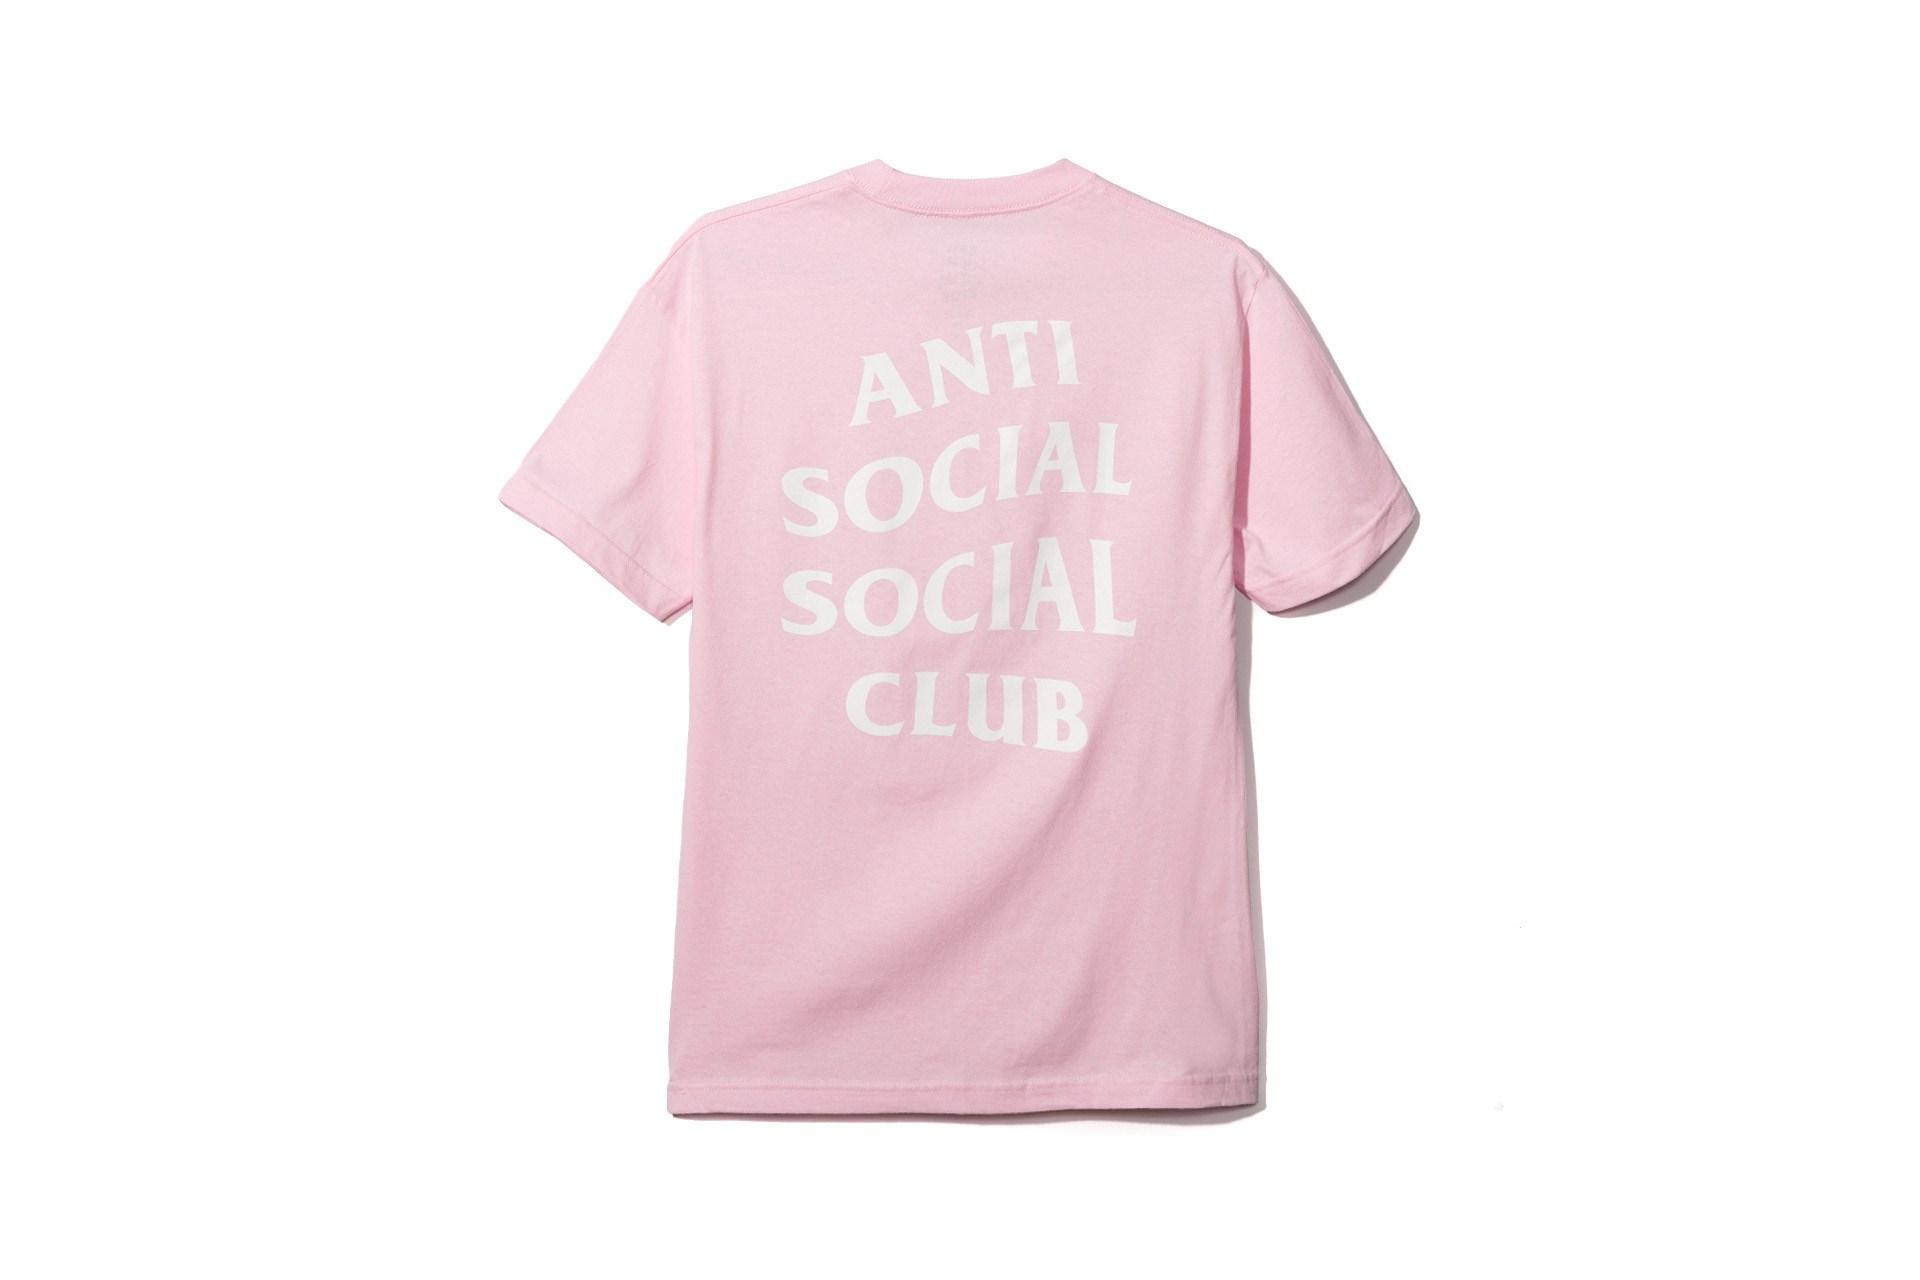 anti-social-social-club-collection-2017-spring-summer-9